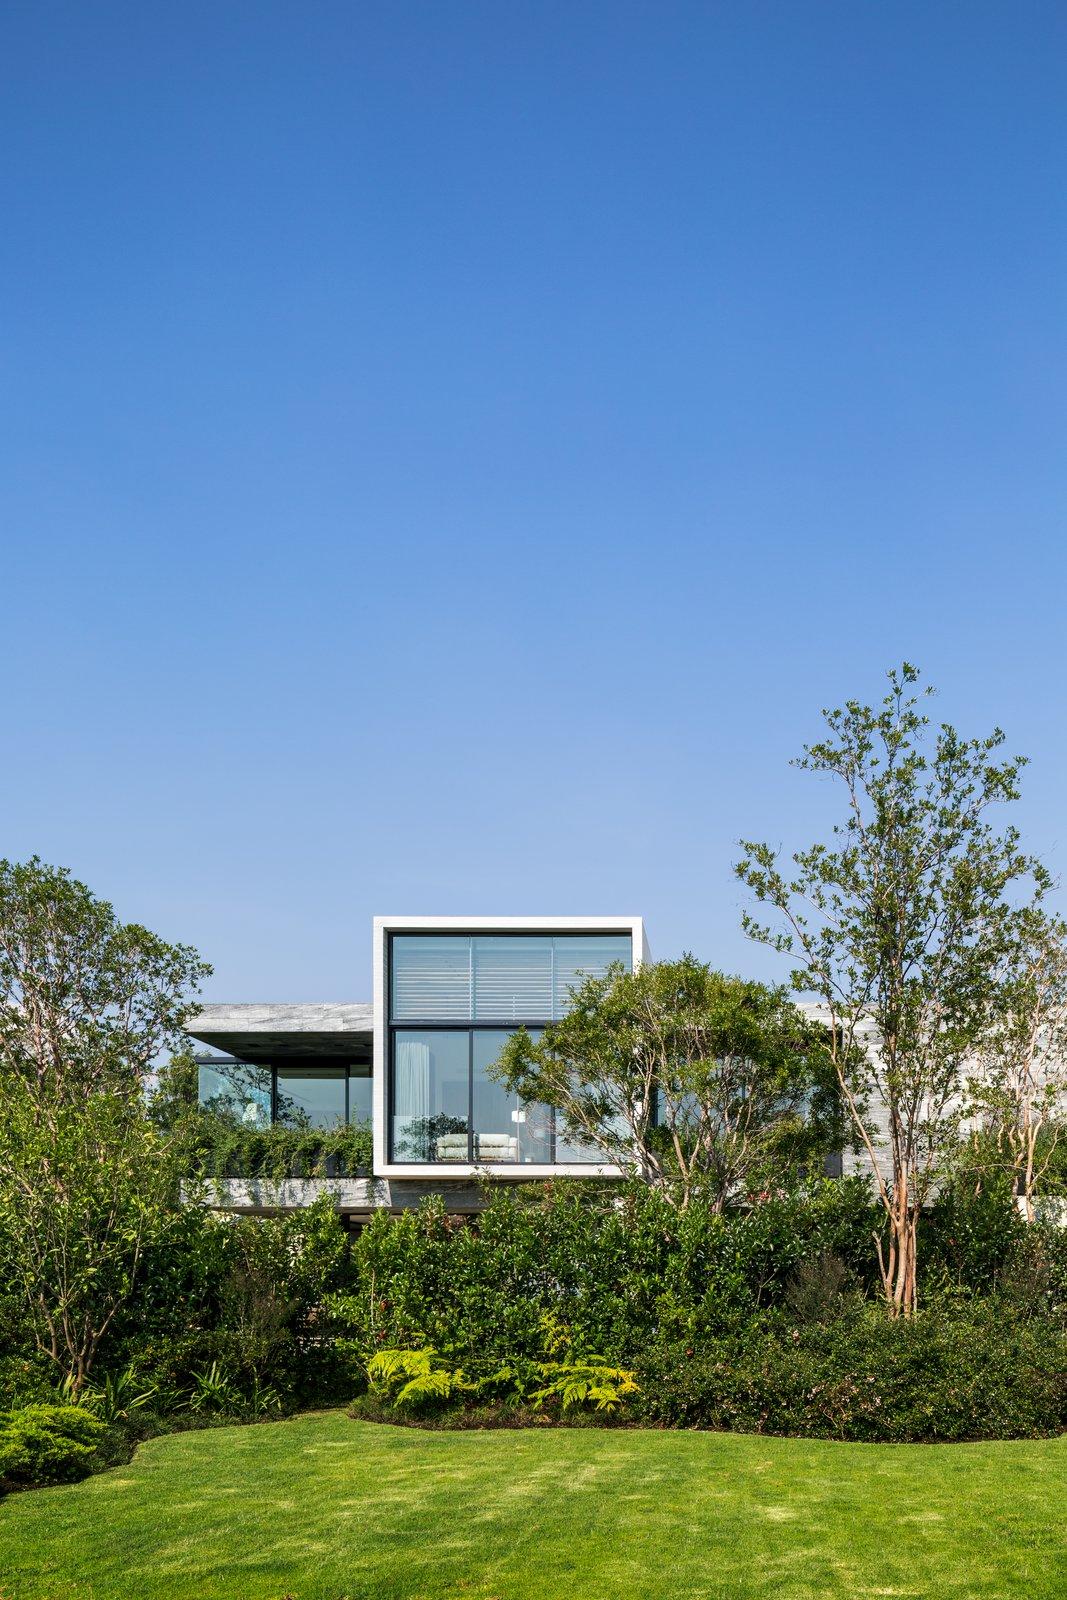 Exterior and House Building Type  Casa O Cuatro by Migdal Arquitectos | Jaime Varon, Abraham Metta, Alex Metta